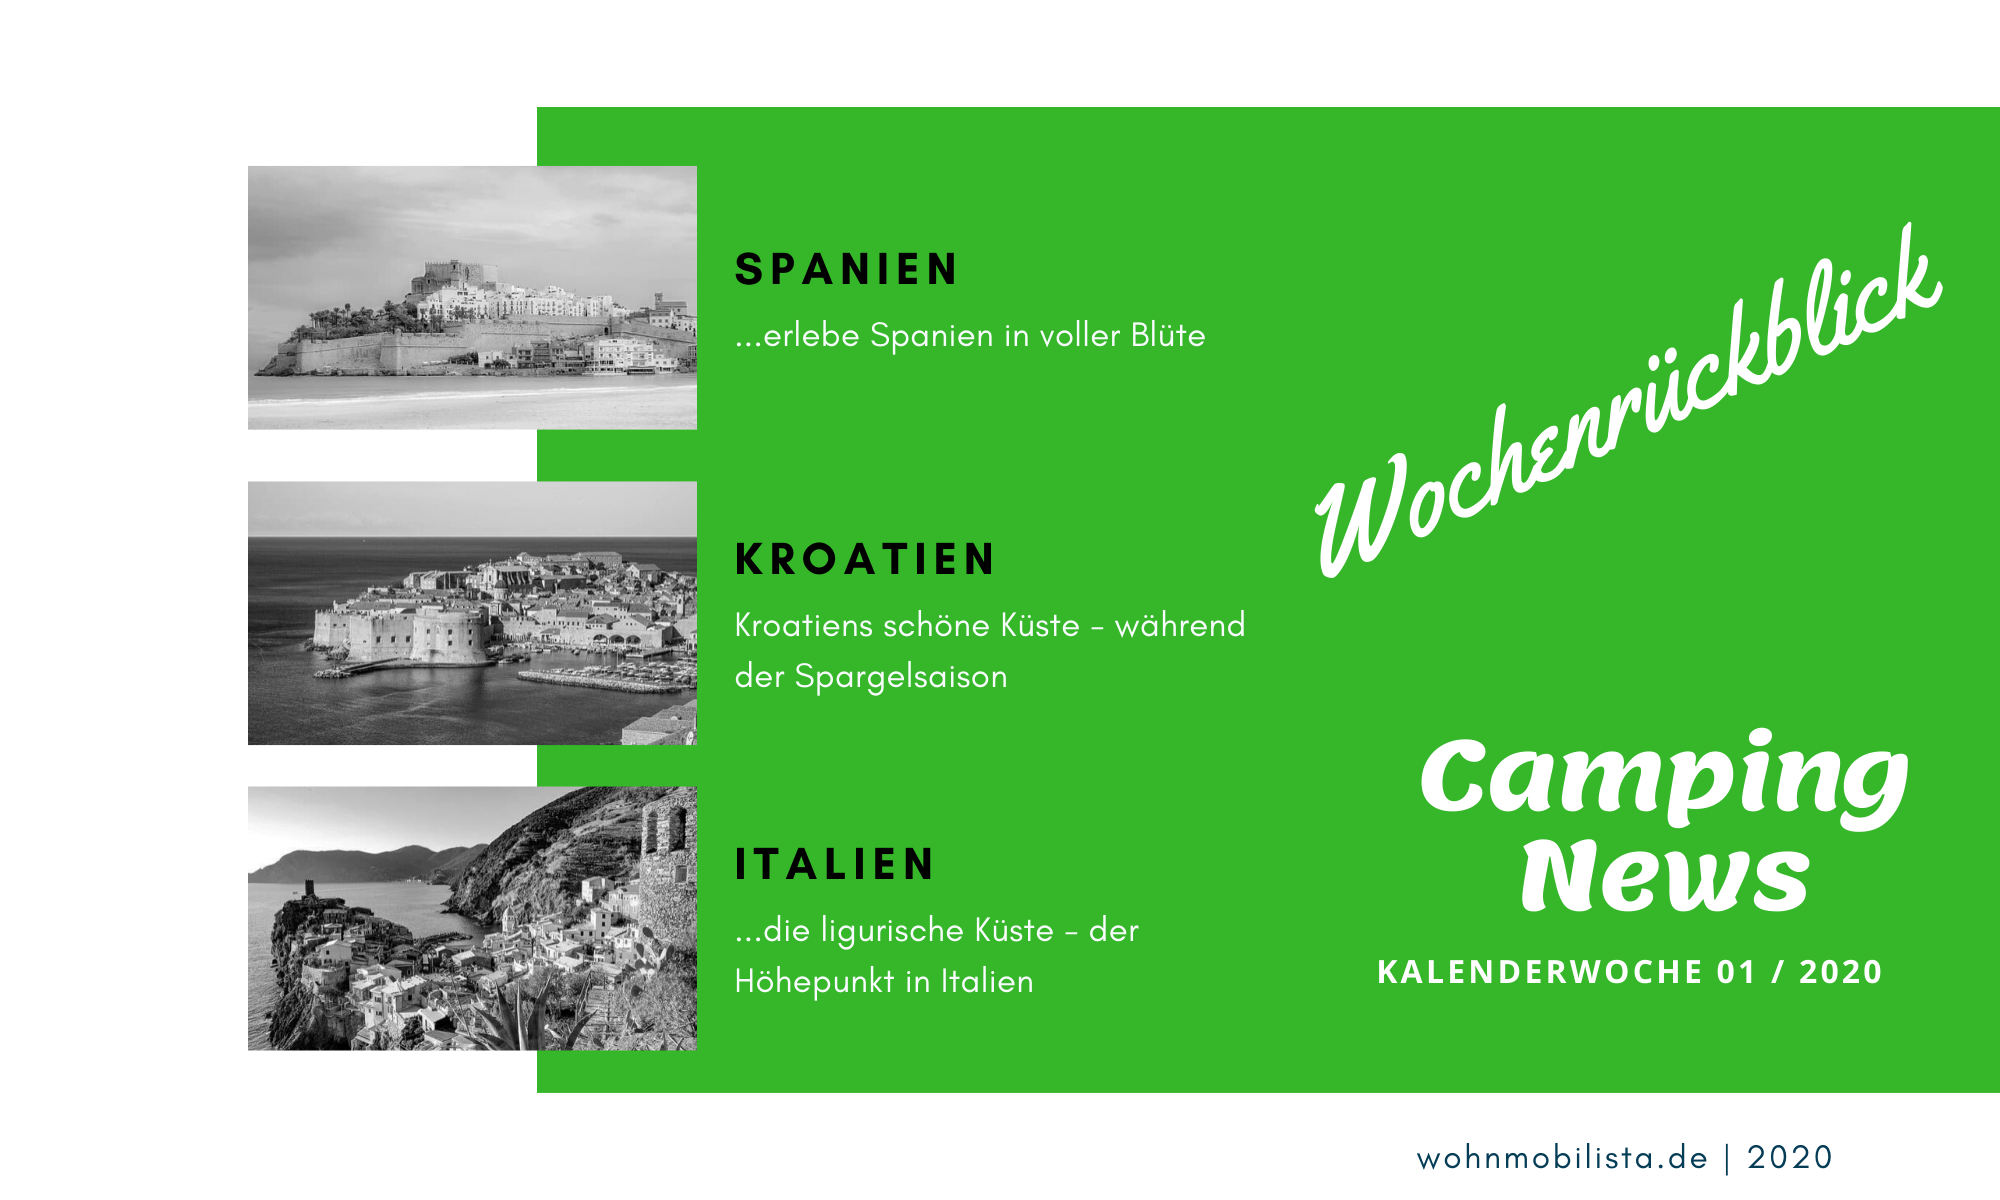 Camping News Wochenrückblick – KW01/2020